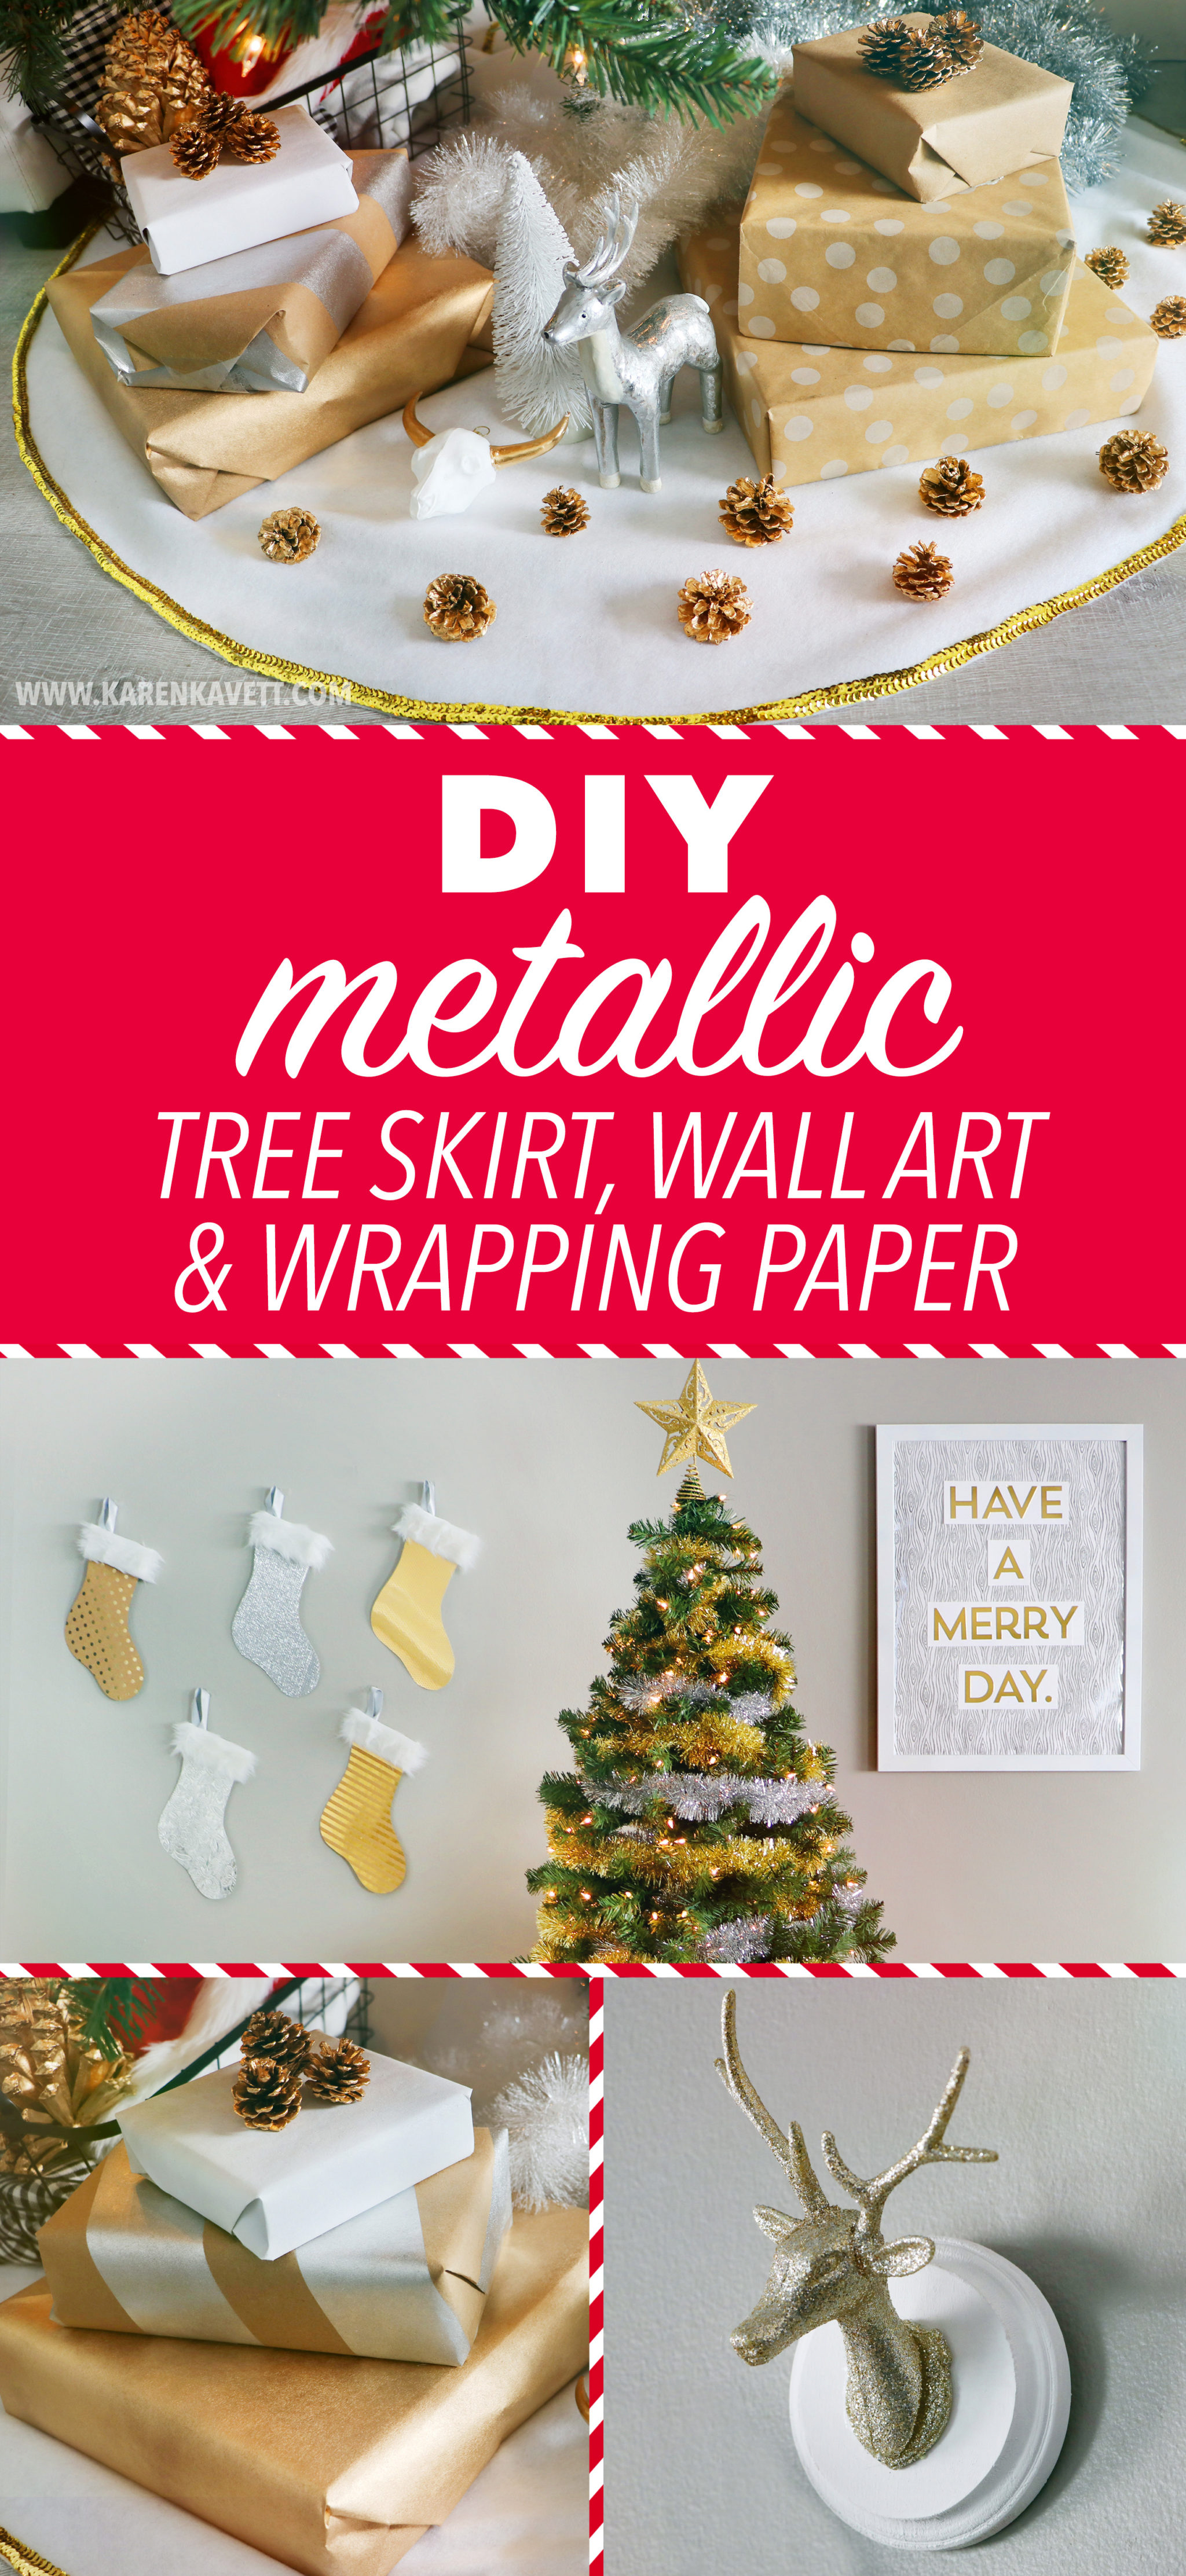 Diy Metallic Christmas Tree Skirt Wall Art Wrapping Paper Holiday 2016 Karen Kavett